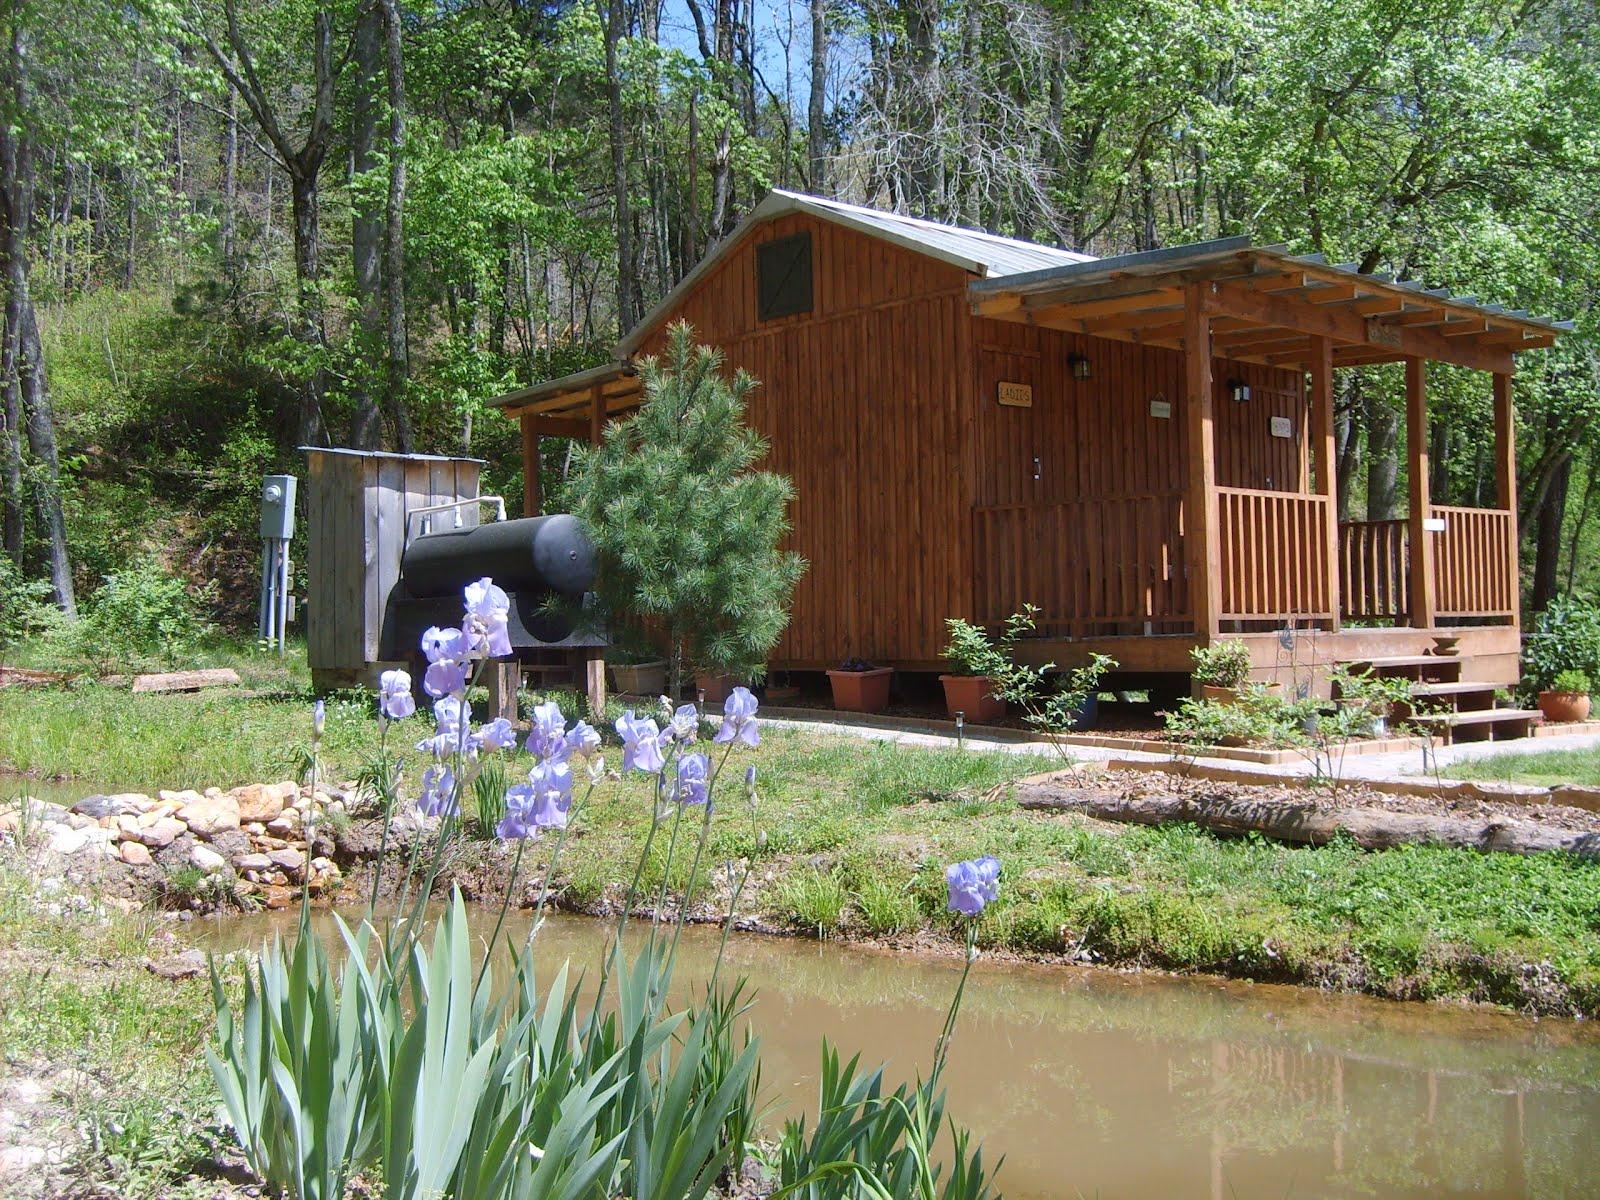 Persimmon Creek Campground April 2012